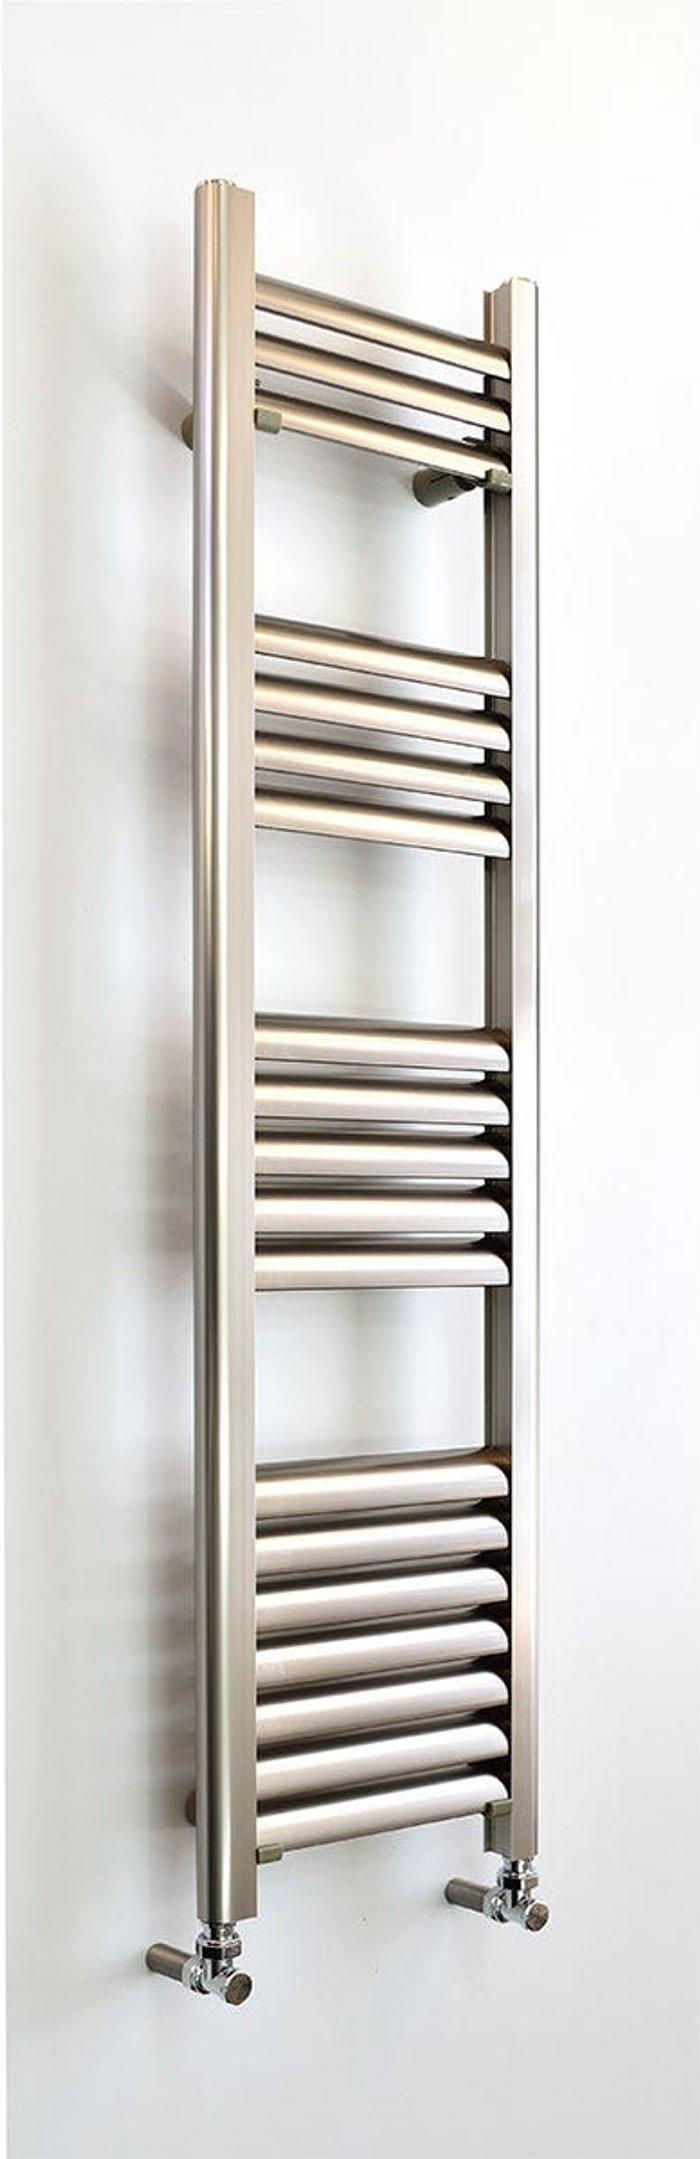 Towelrads Towelrads Accuro Korle Champagne 1200mm x 300mm Aluminium Towel Warmer - Brushed Aluminium